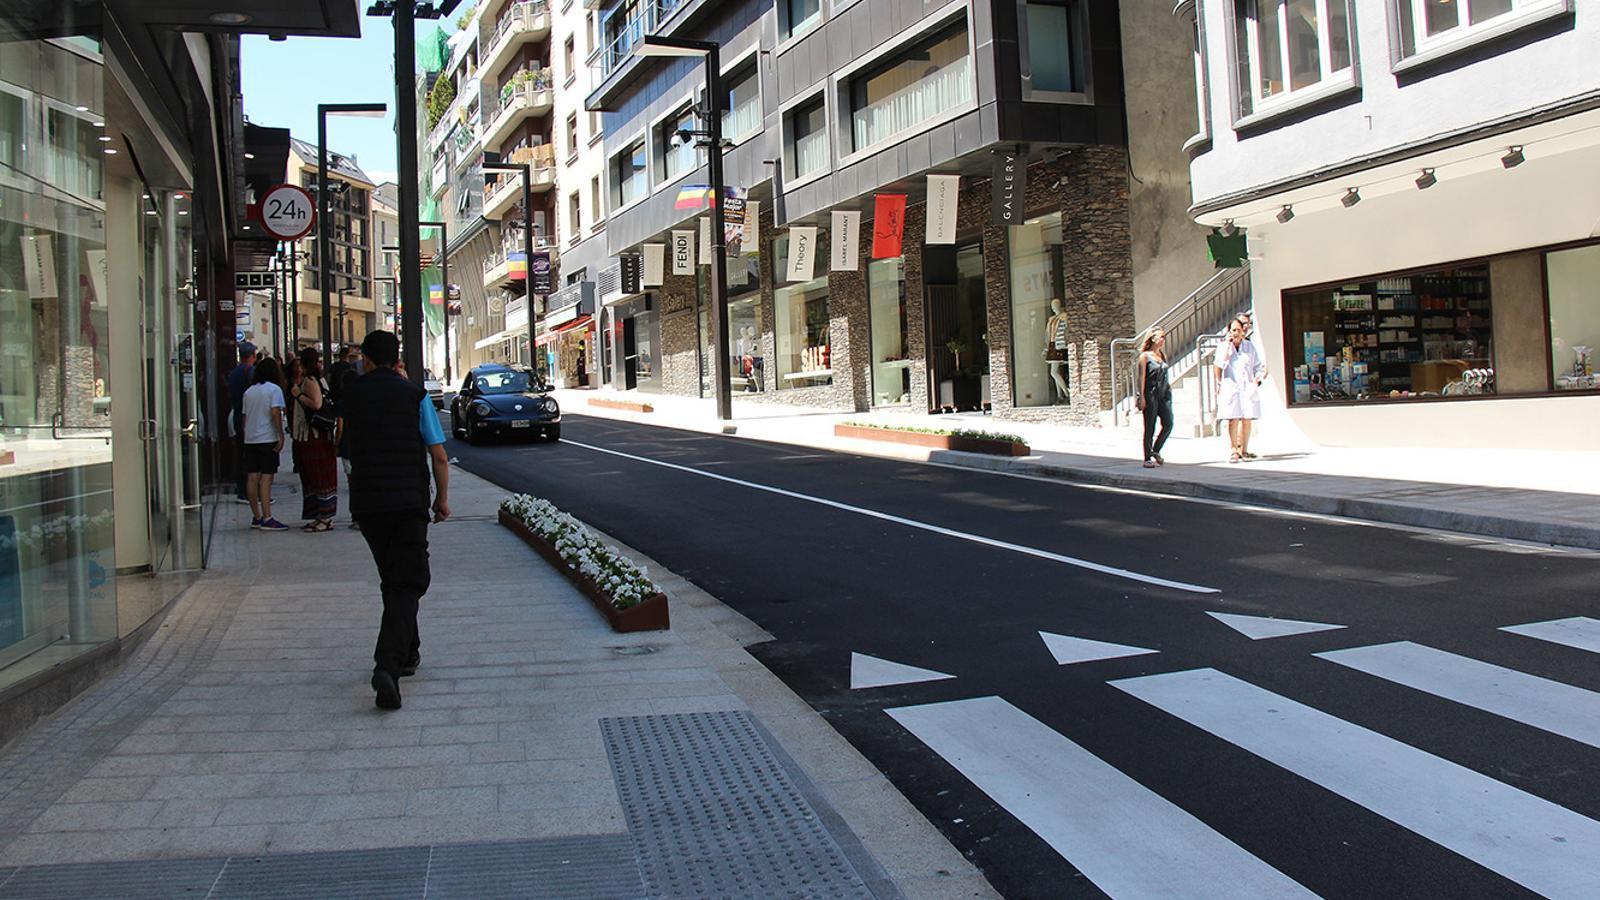 Un tram de l'avinguda Meritxell remodelada. / M. F. (ANA)